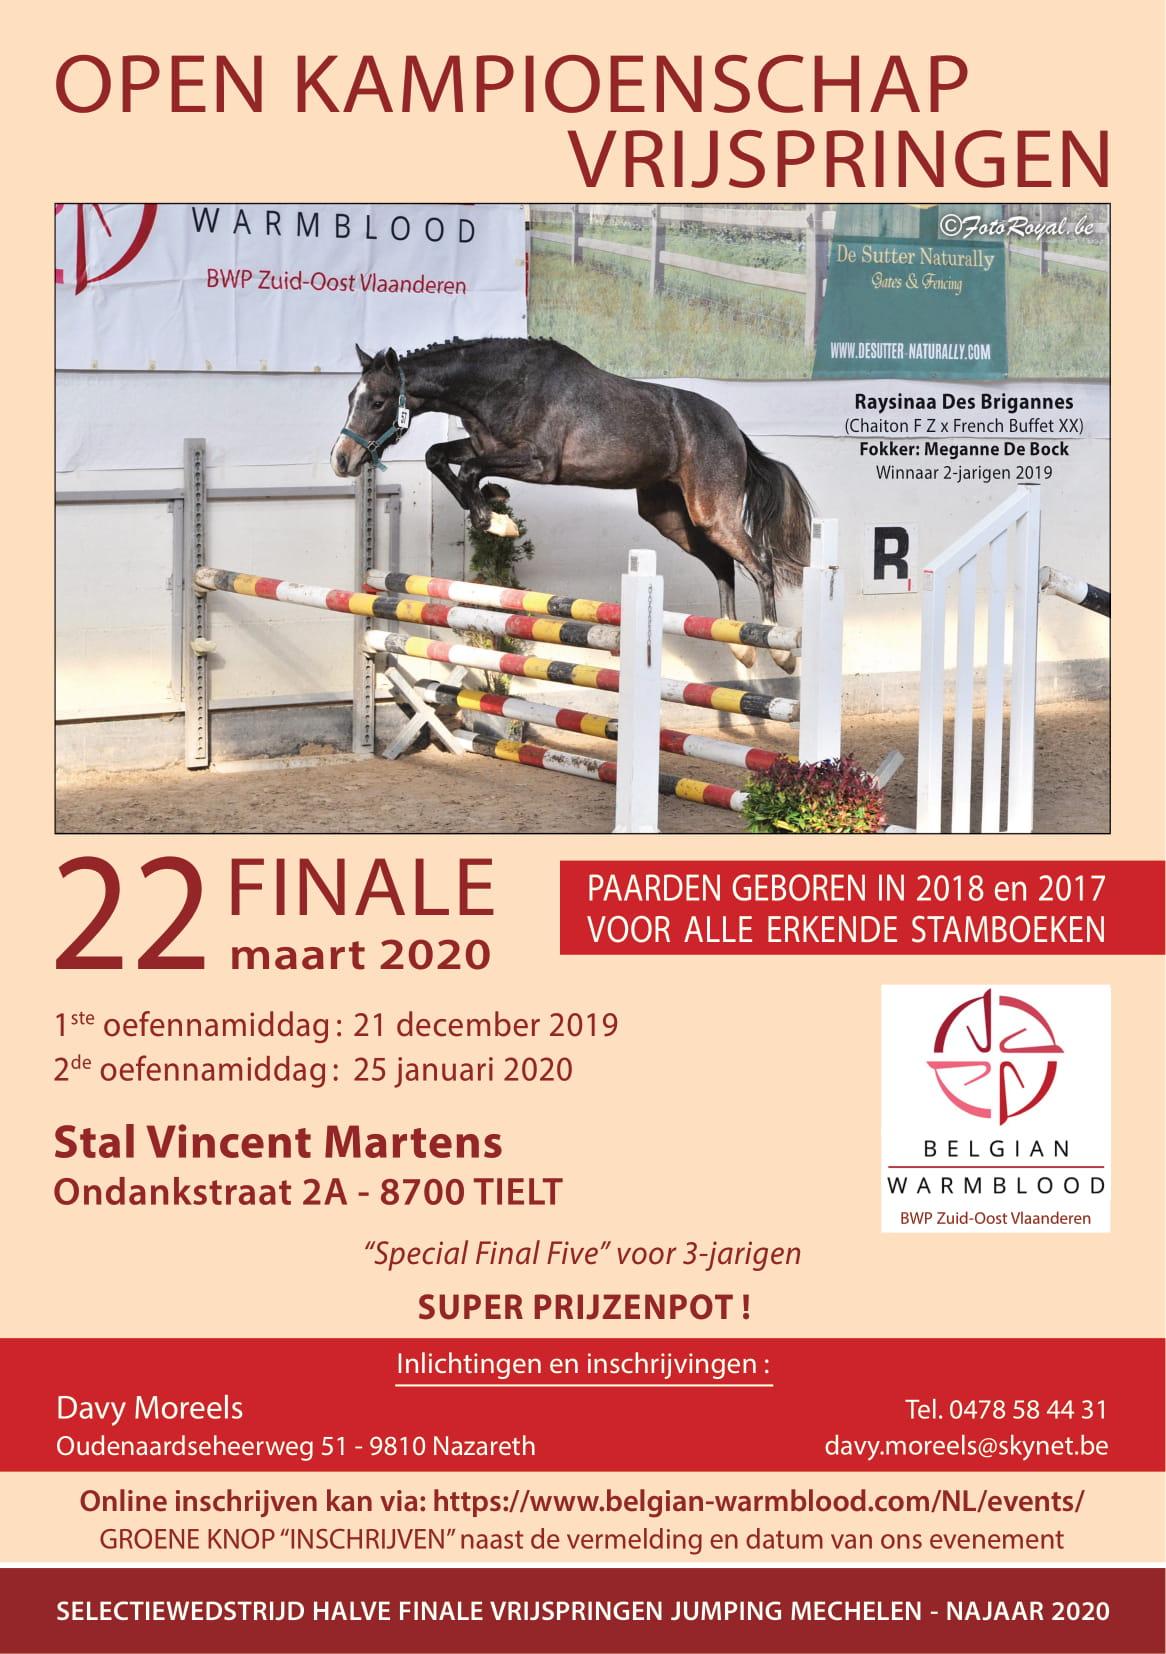 PROMO: Tweede oefennamiddag vrijspringen BWP Z-O-Vl. Locatiewijziging & selectie BWP Young Horses Auction